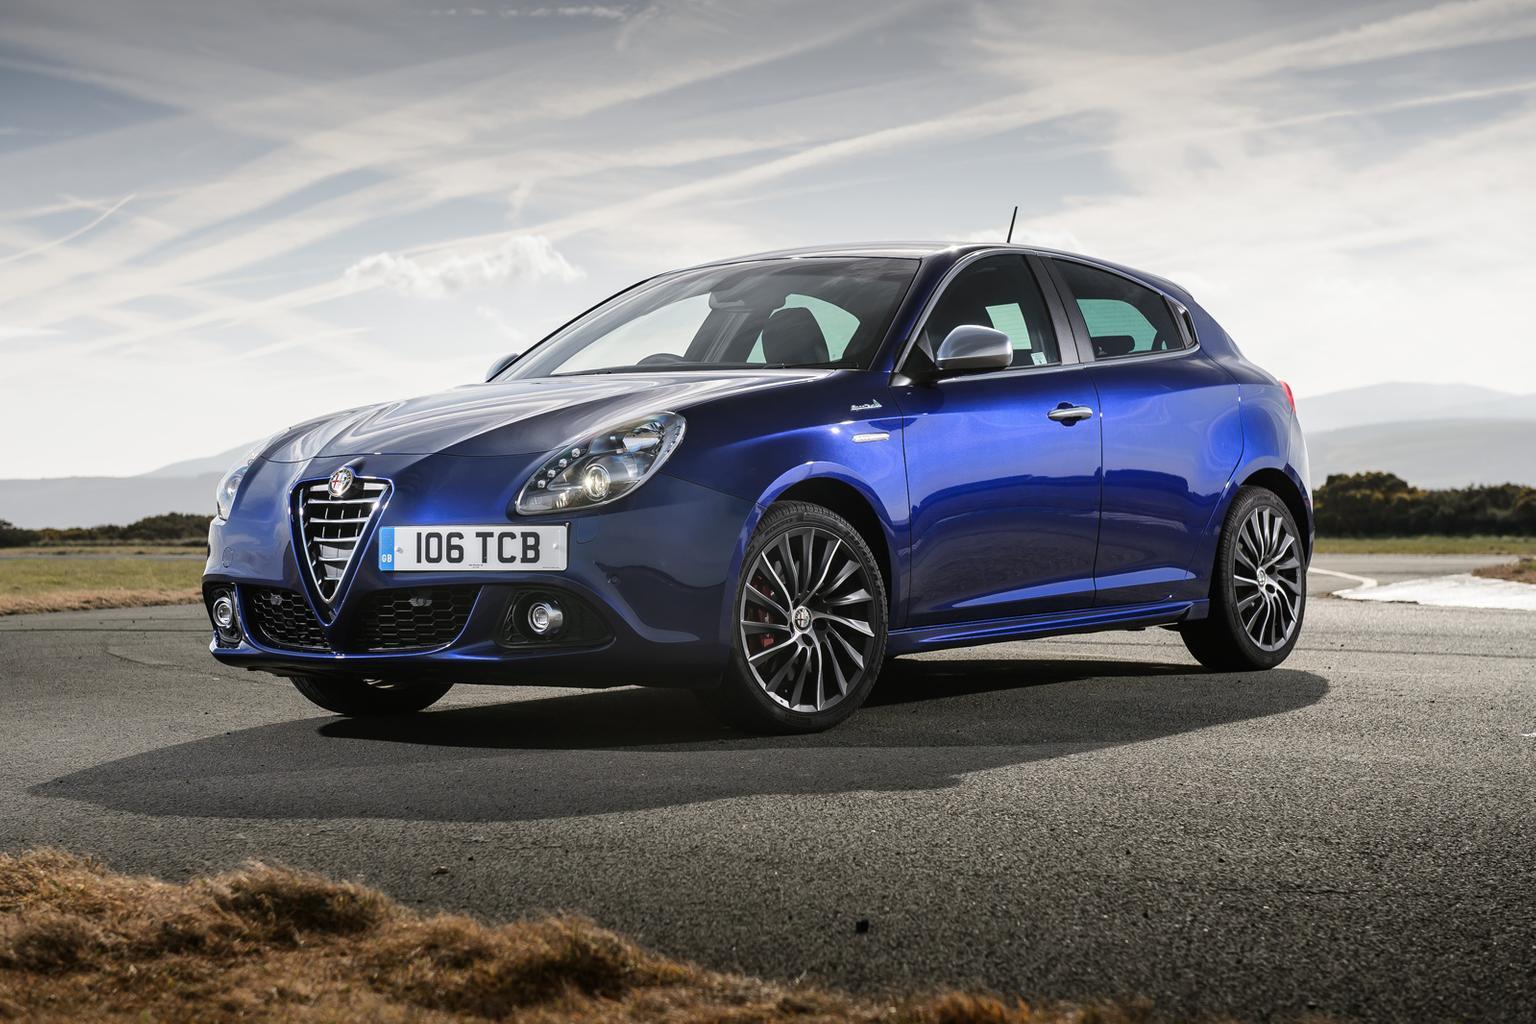 2014 Alfa Romeo Giulietta review